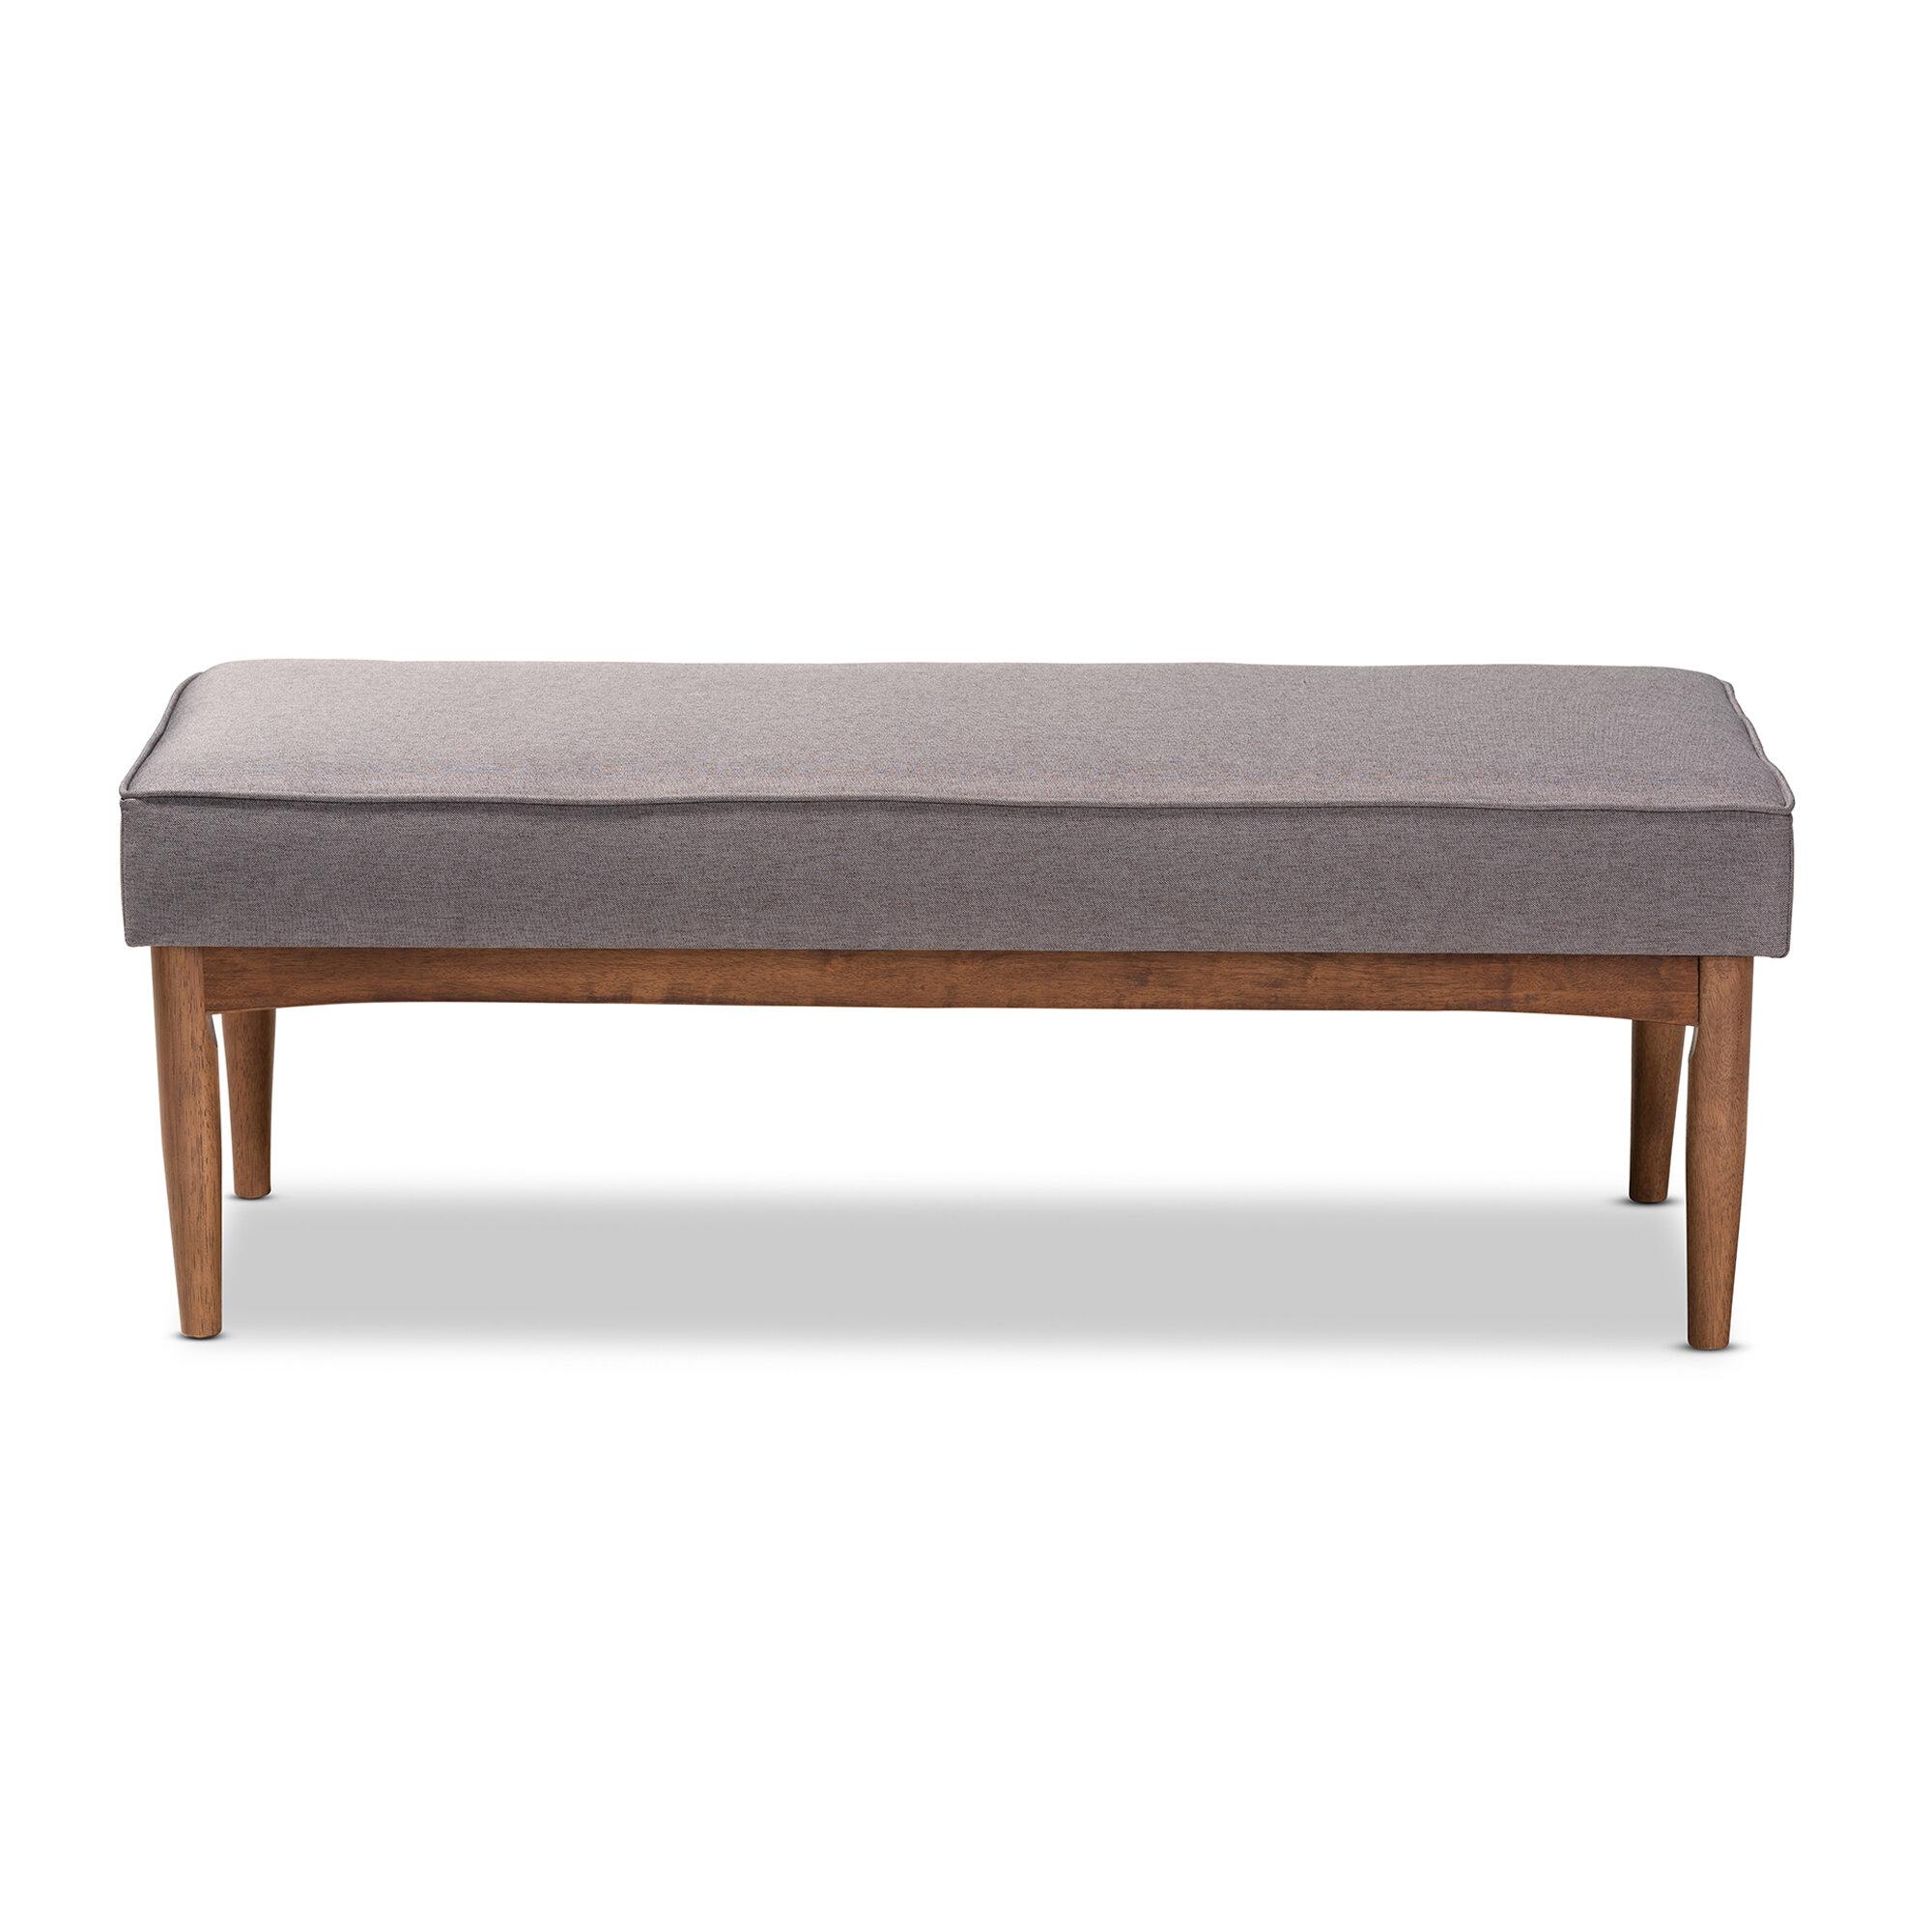 Corrigan Studio Arvid Mid Century Modern Grey Fabric Upholstered Wood Dining  Bench | Wayfair.ca